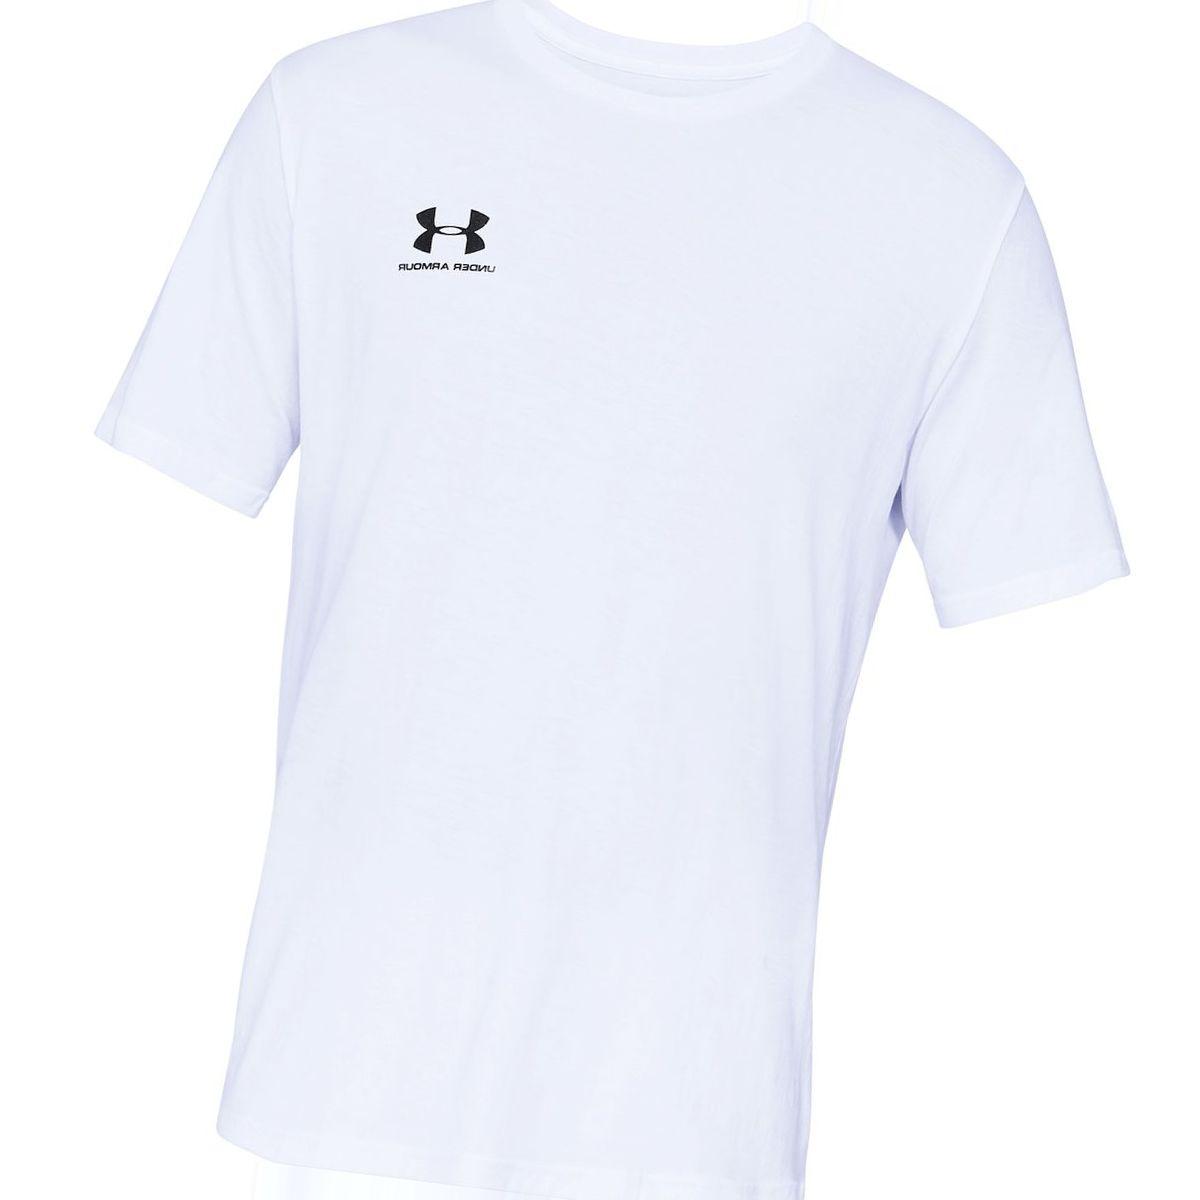 Under Armour Sportstyle Left Chest Short-Sleeve Shirt - Men's